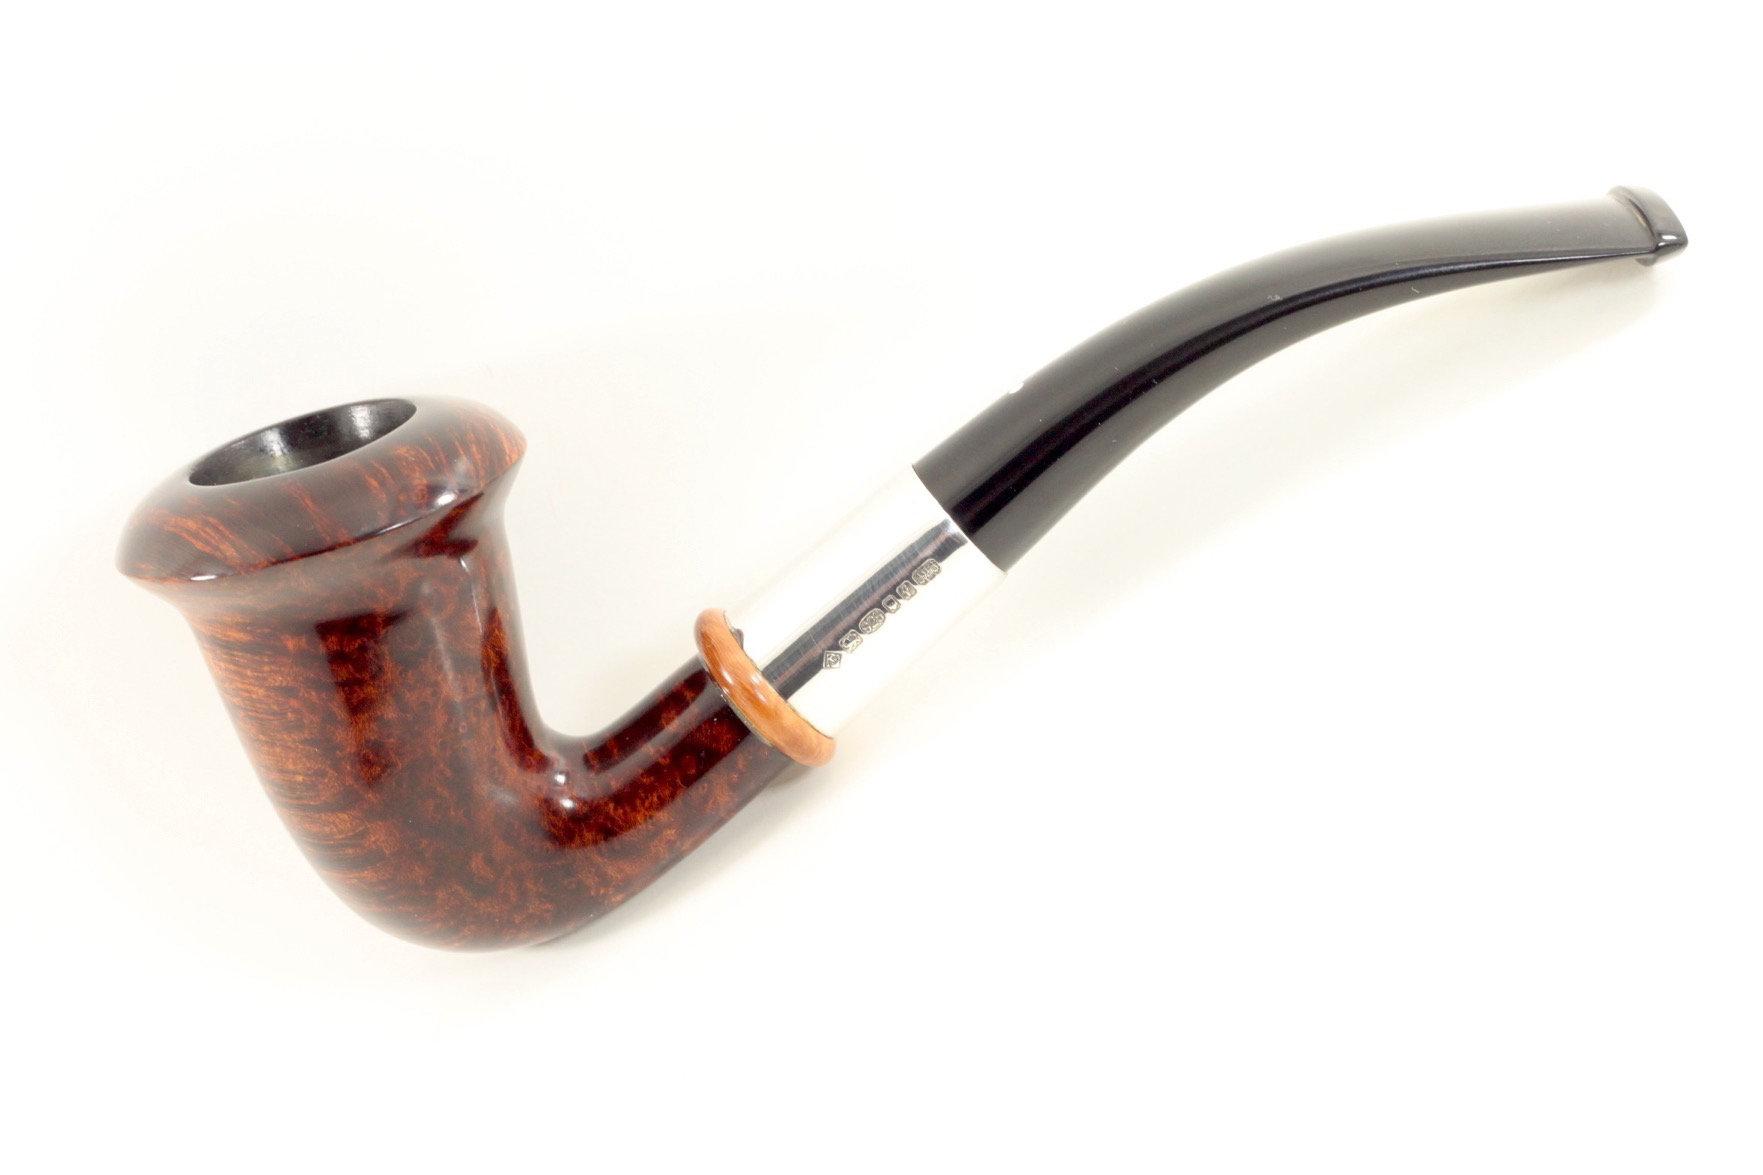 Calabash Pipe